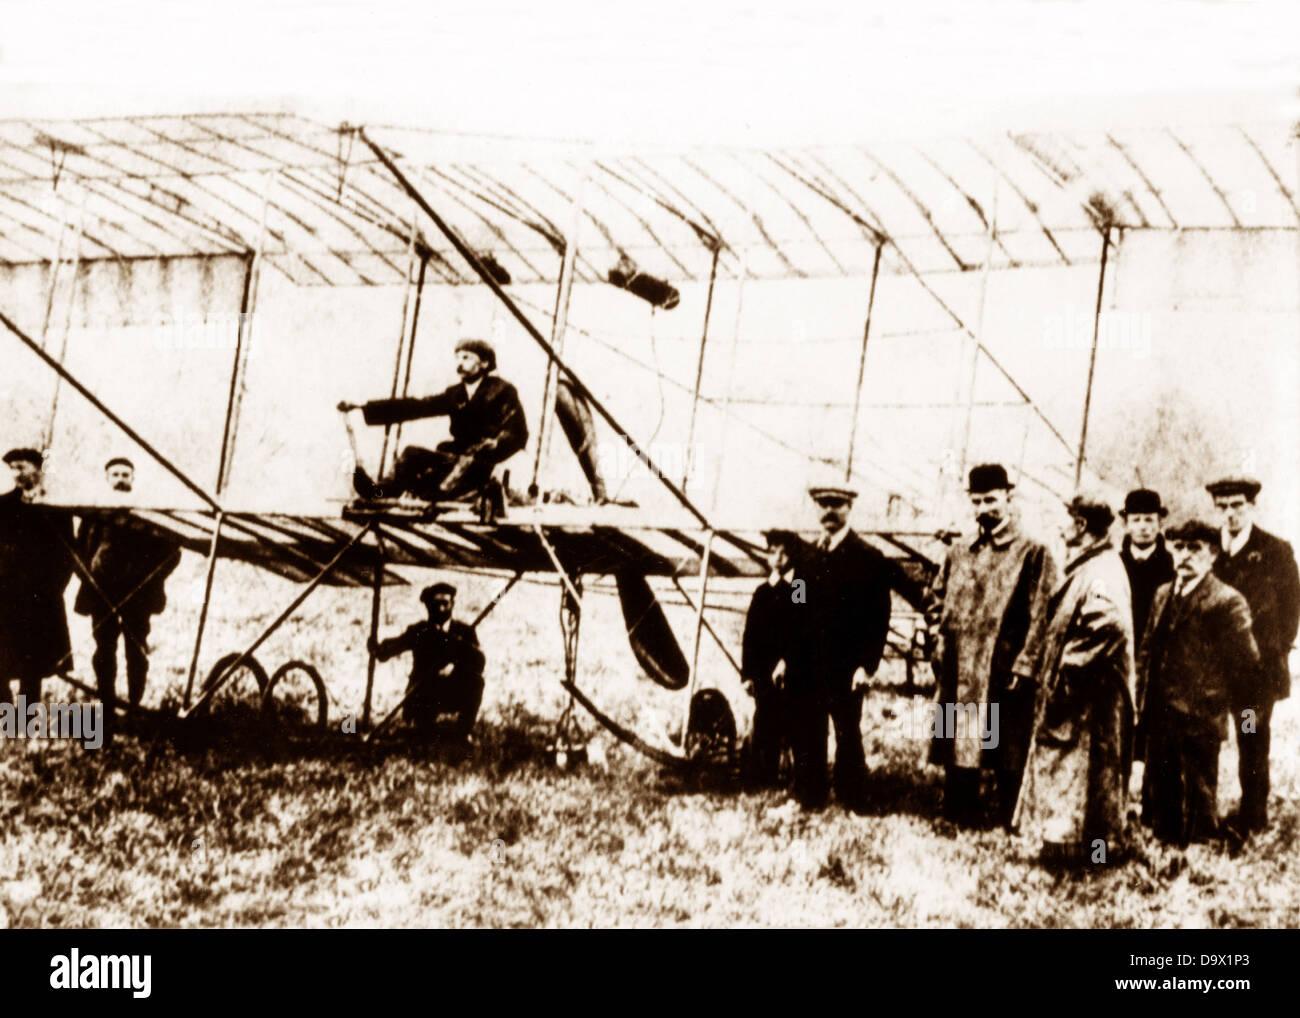 Empress biplane early 1900s Stock Photo